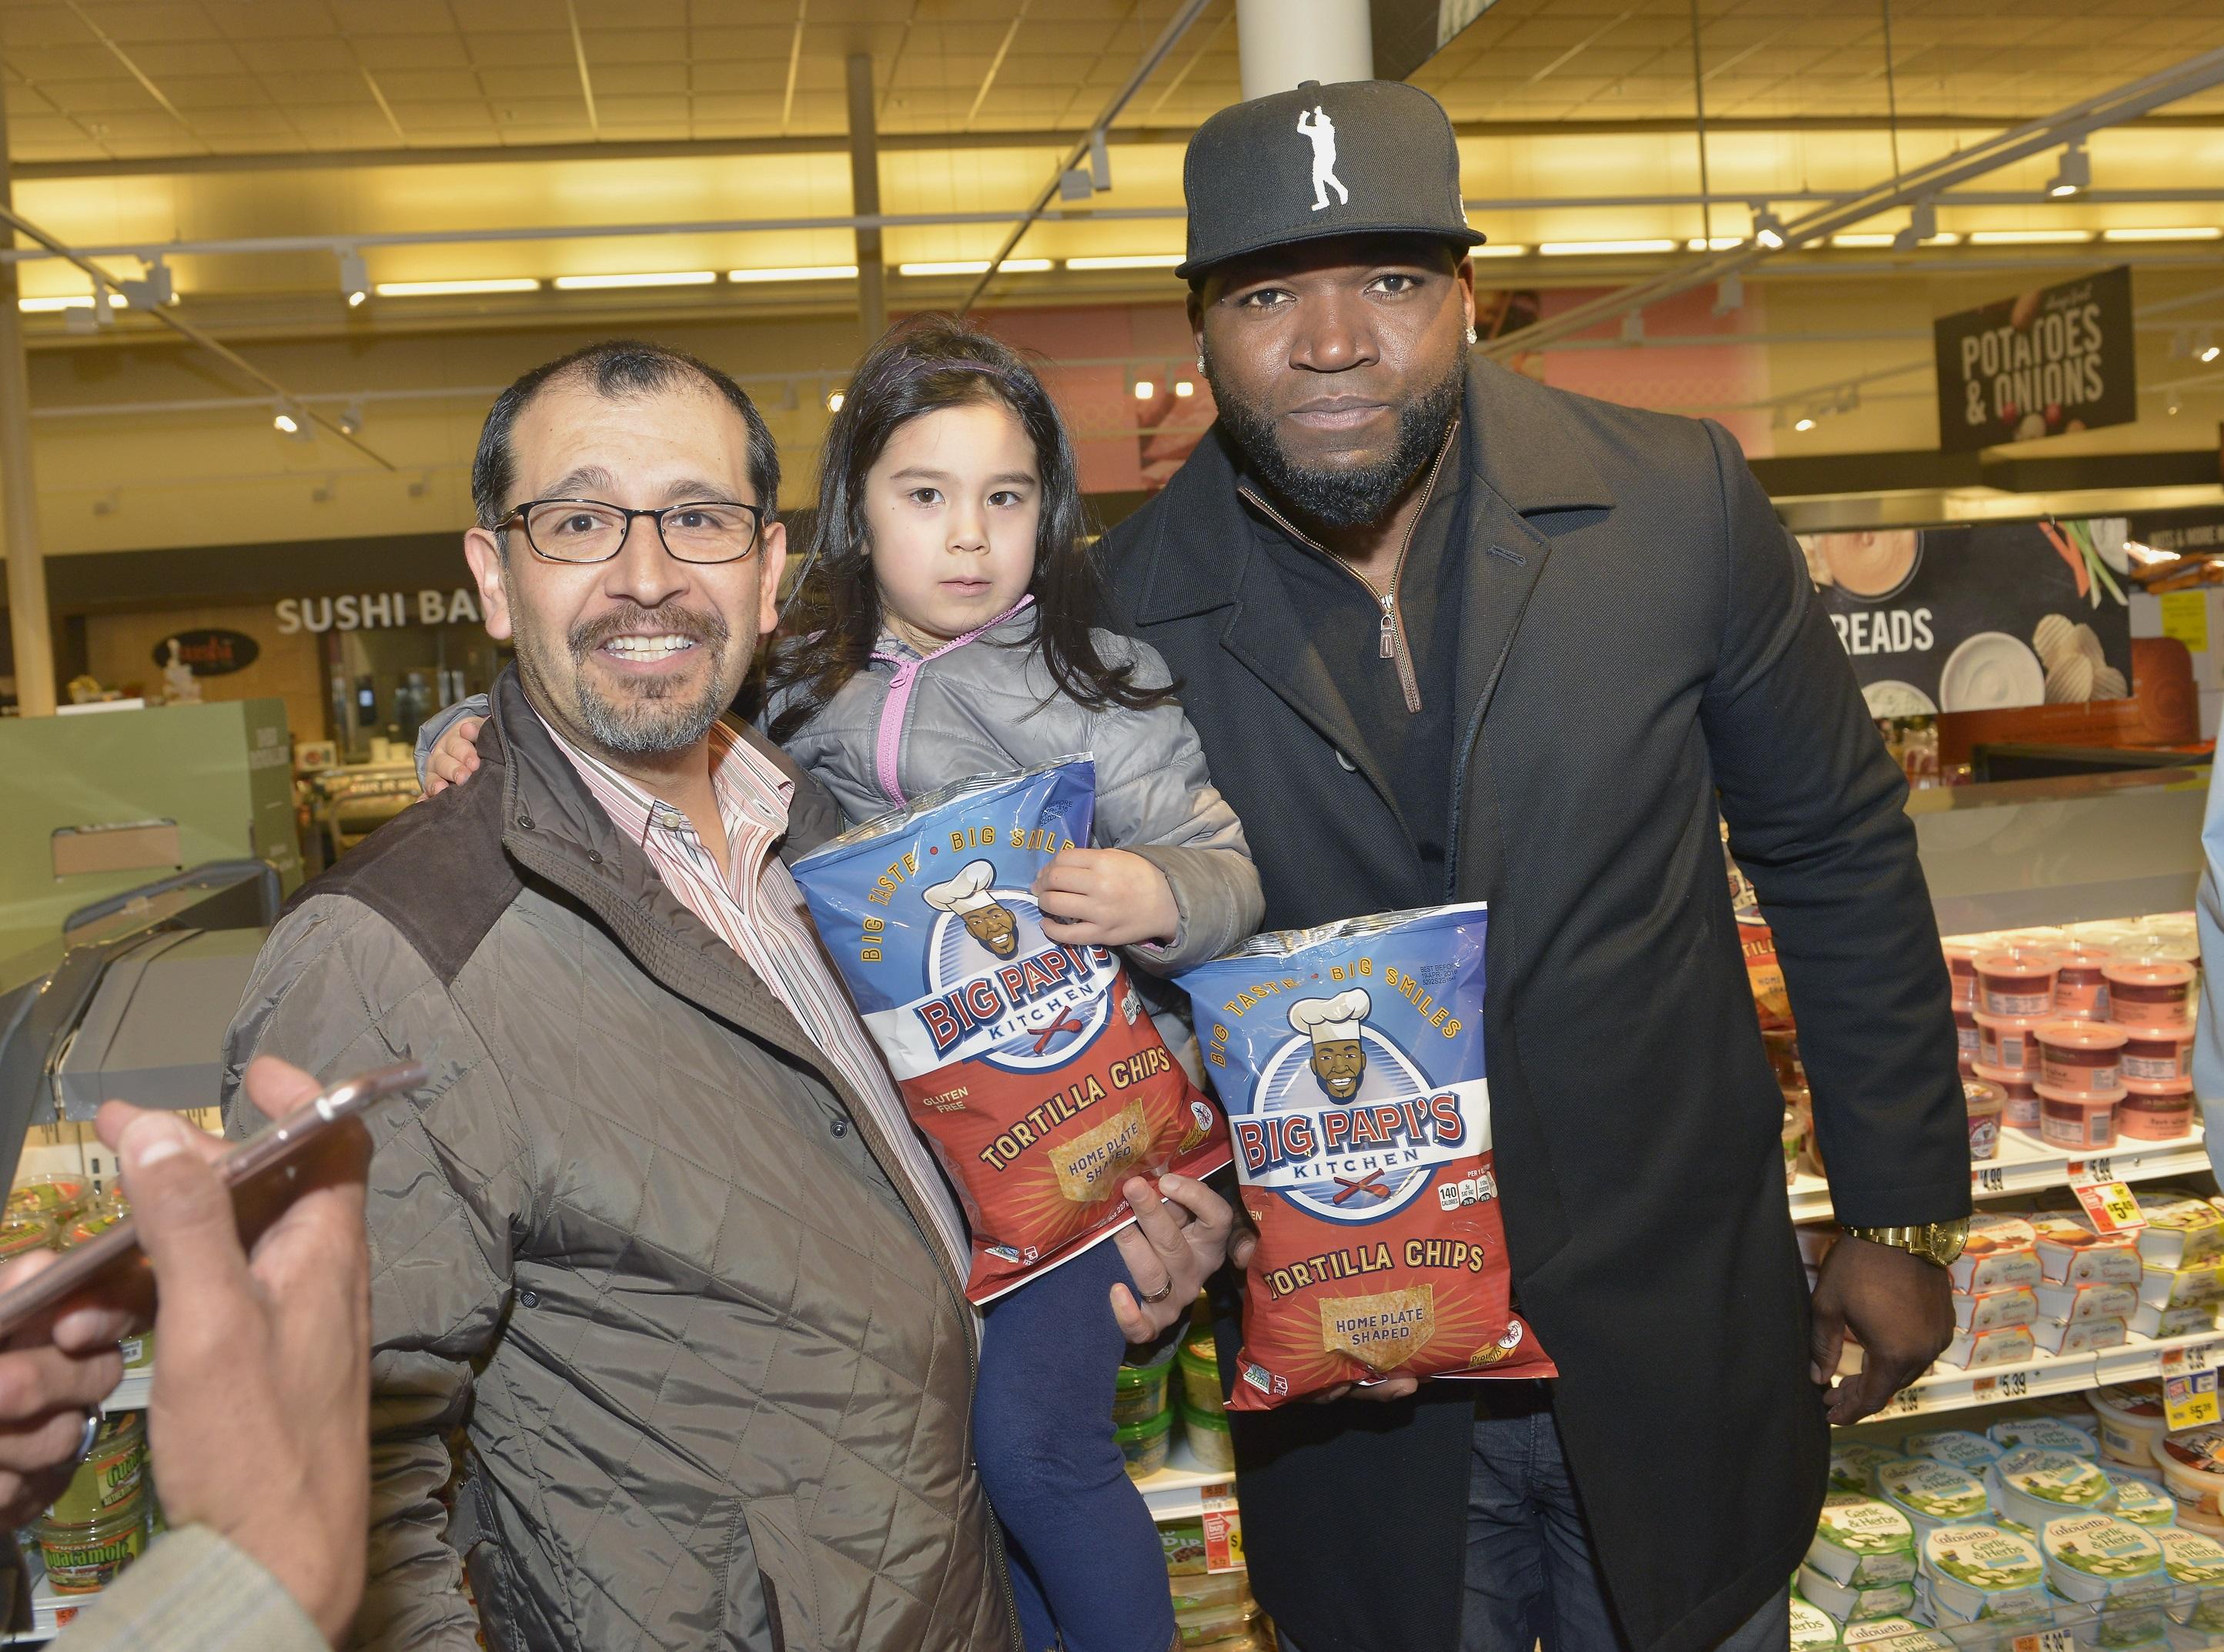 David Ortiz Surprises At The Grocery Store The Boston Globe